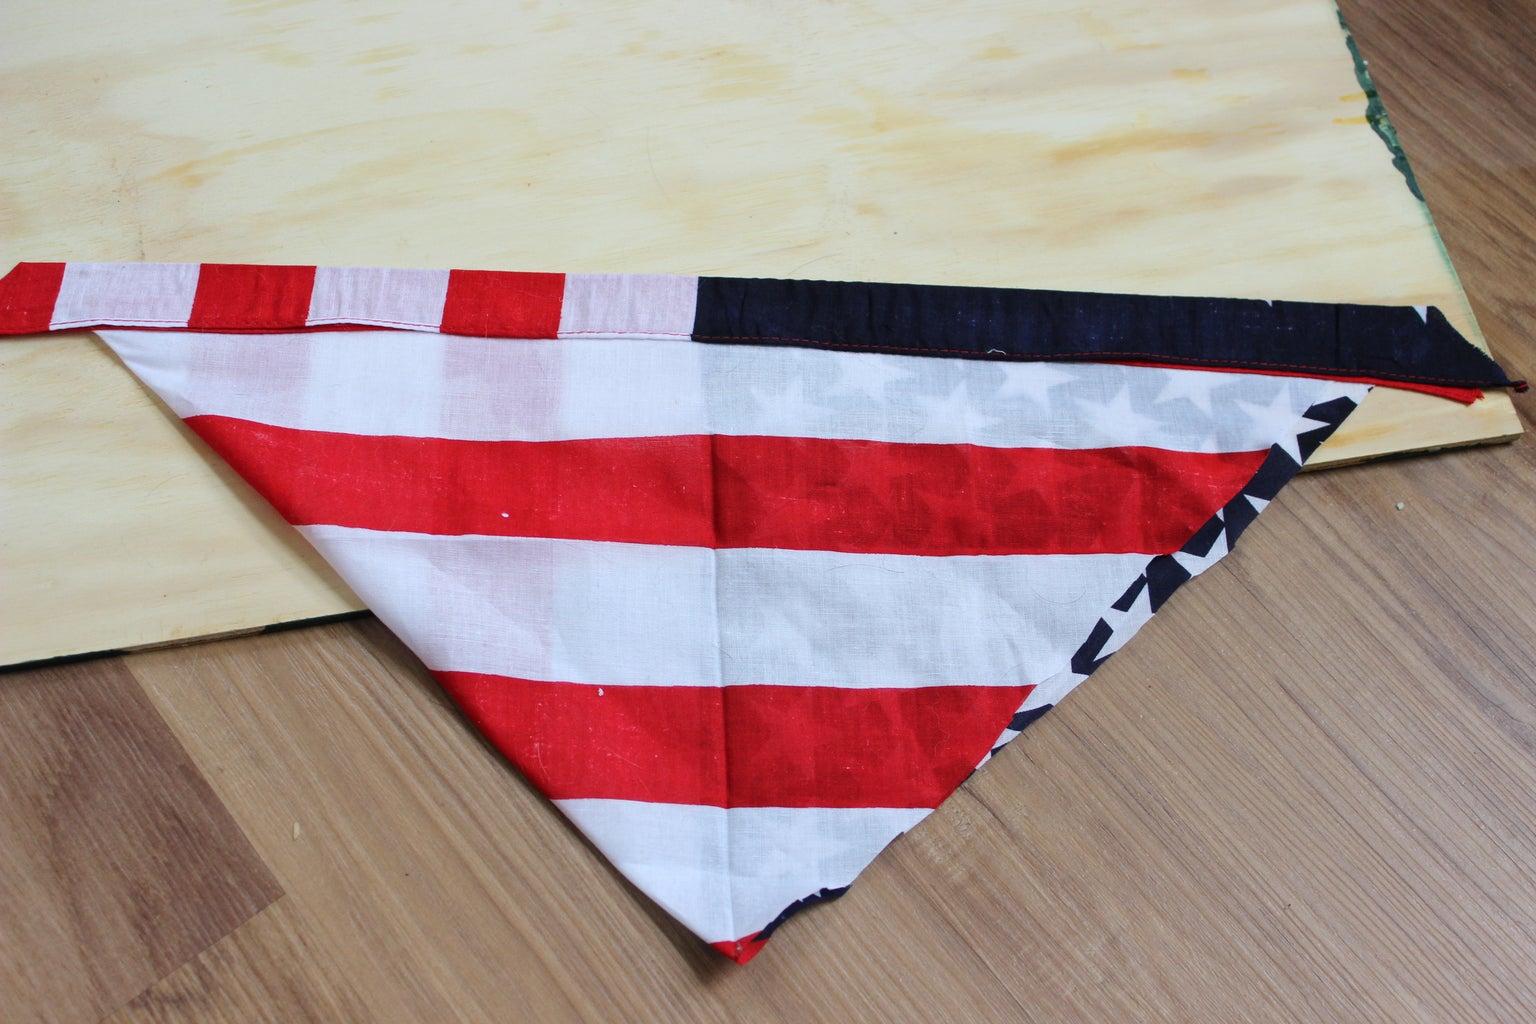 Bandana Triangle Design Part 2: Iron and Fold